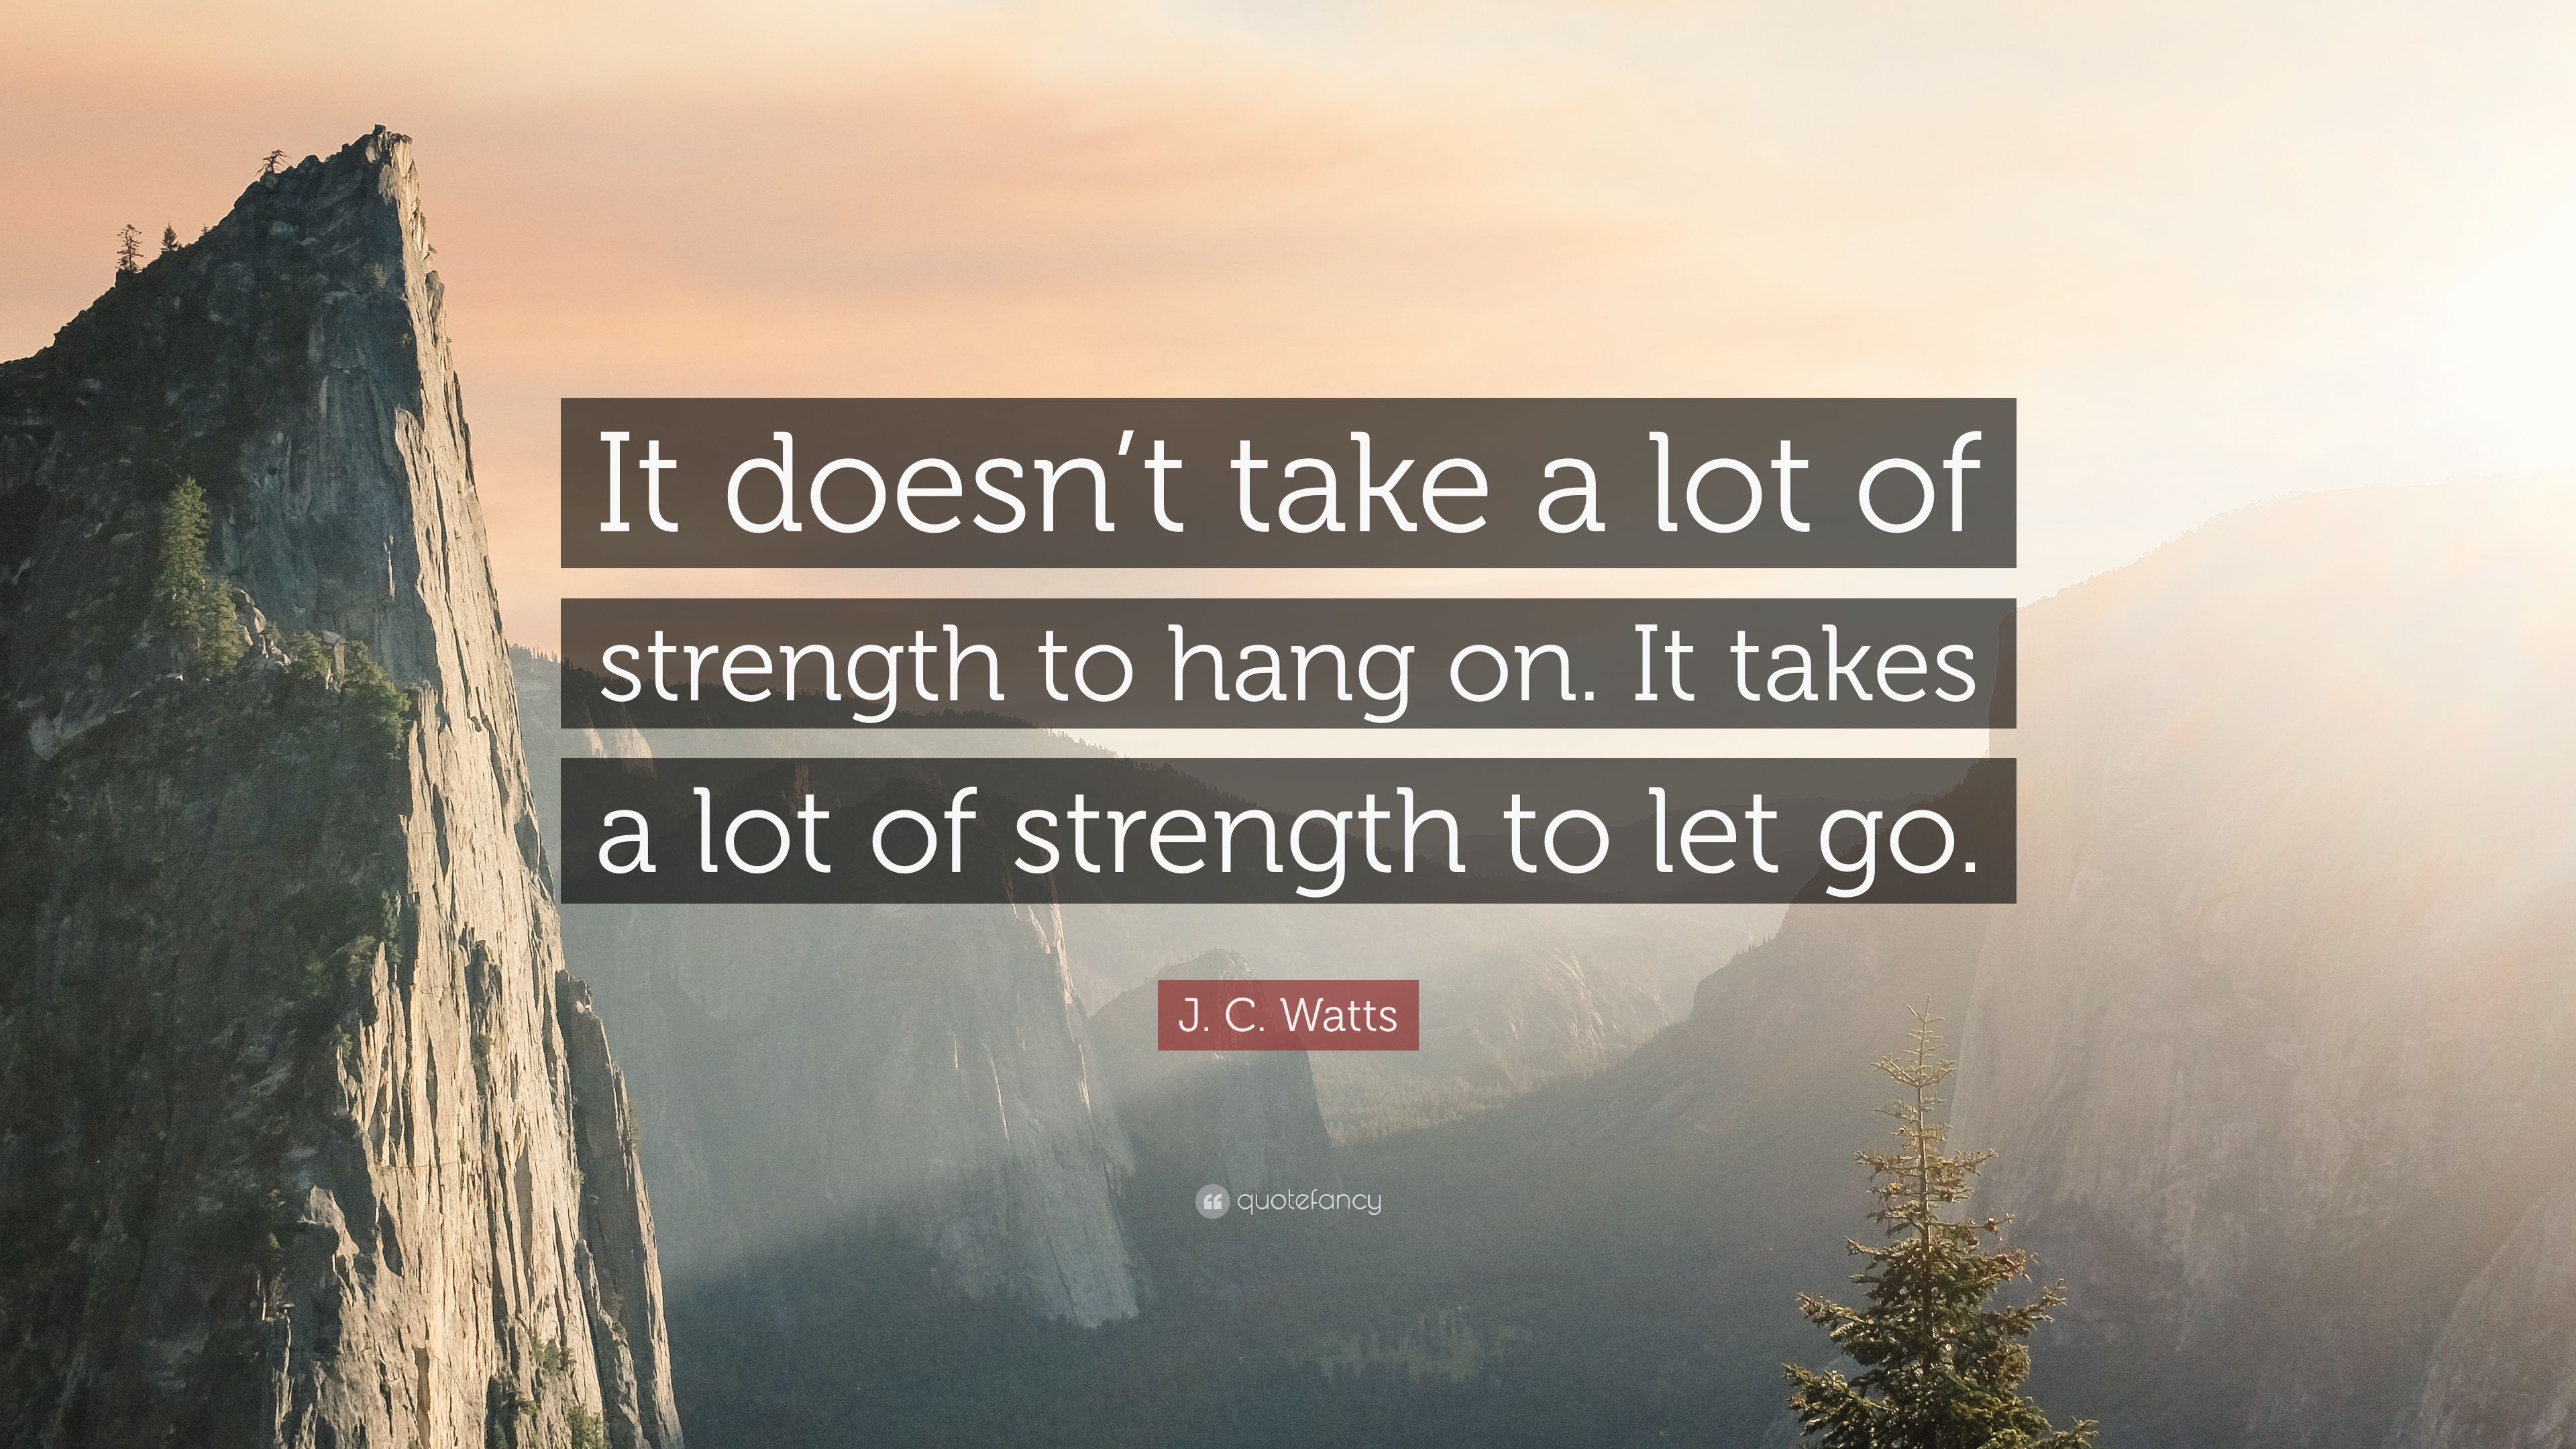 J  C  Watts Quote   U201cit Doesn U2019t Take A Lot Of Strength To